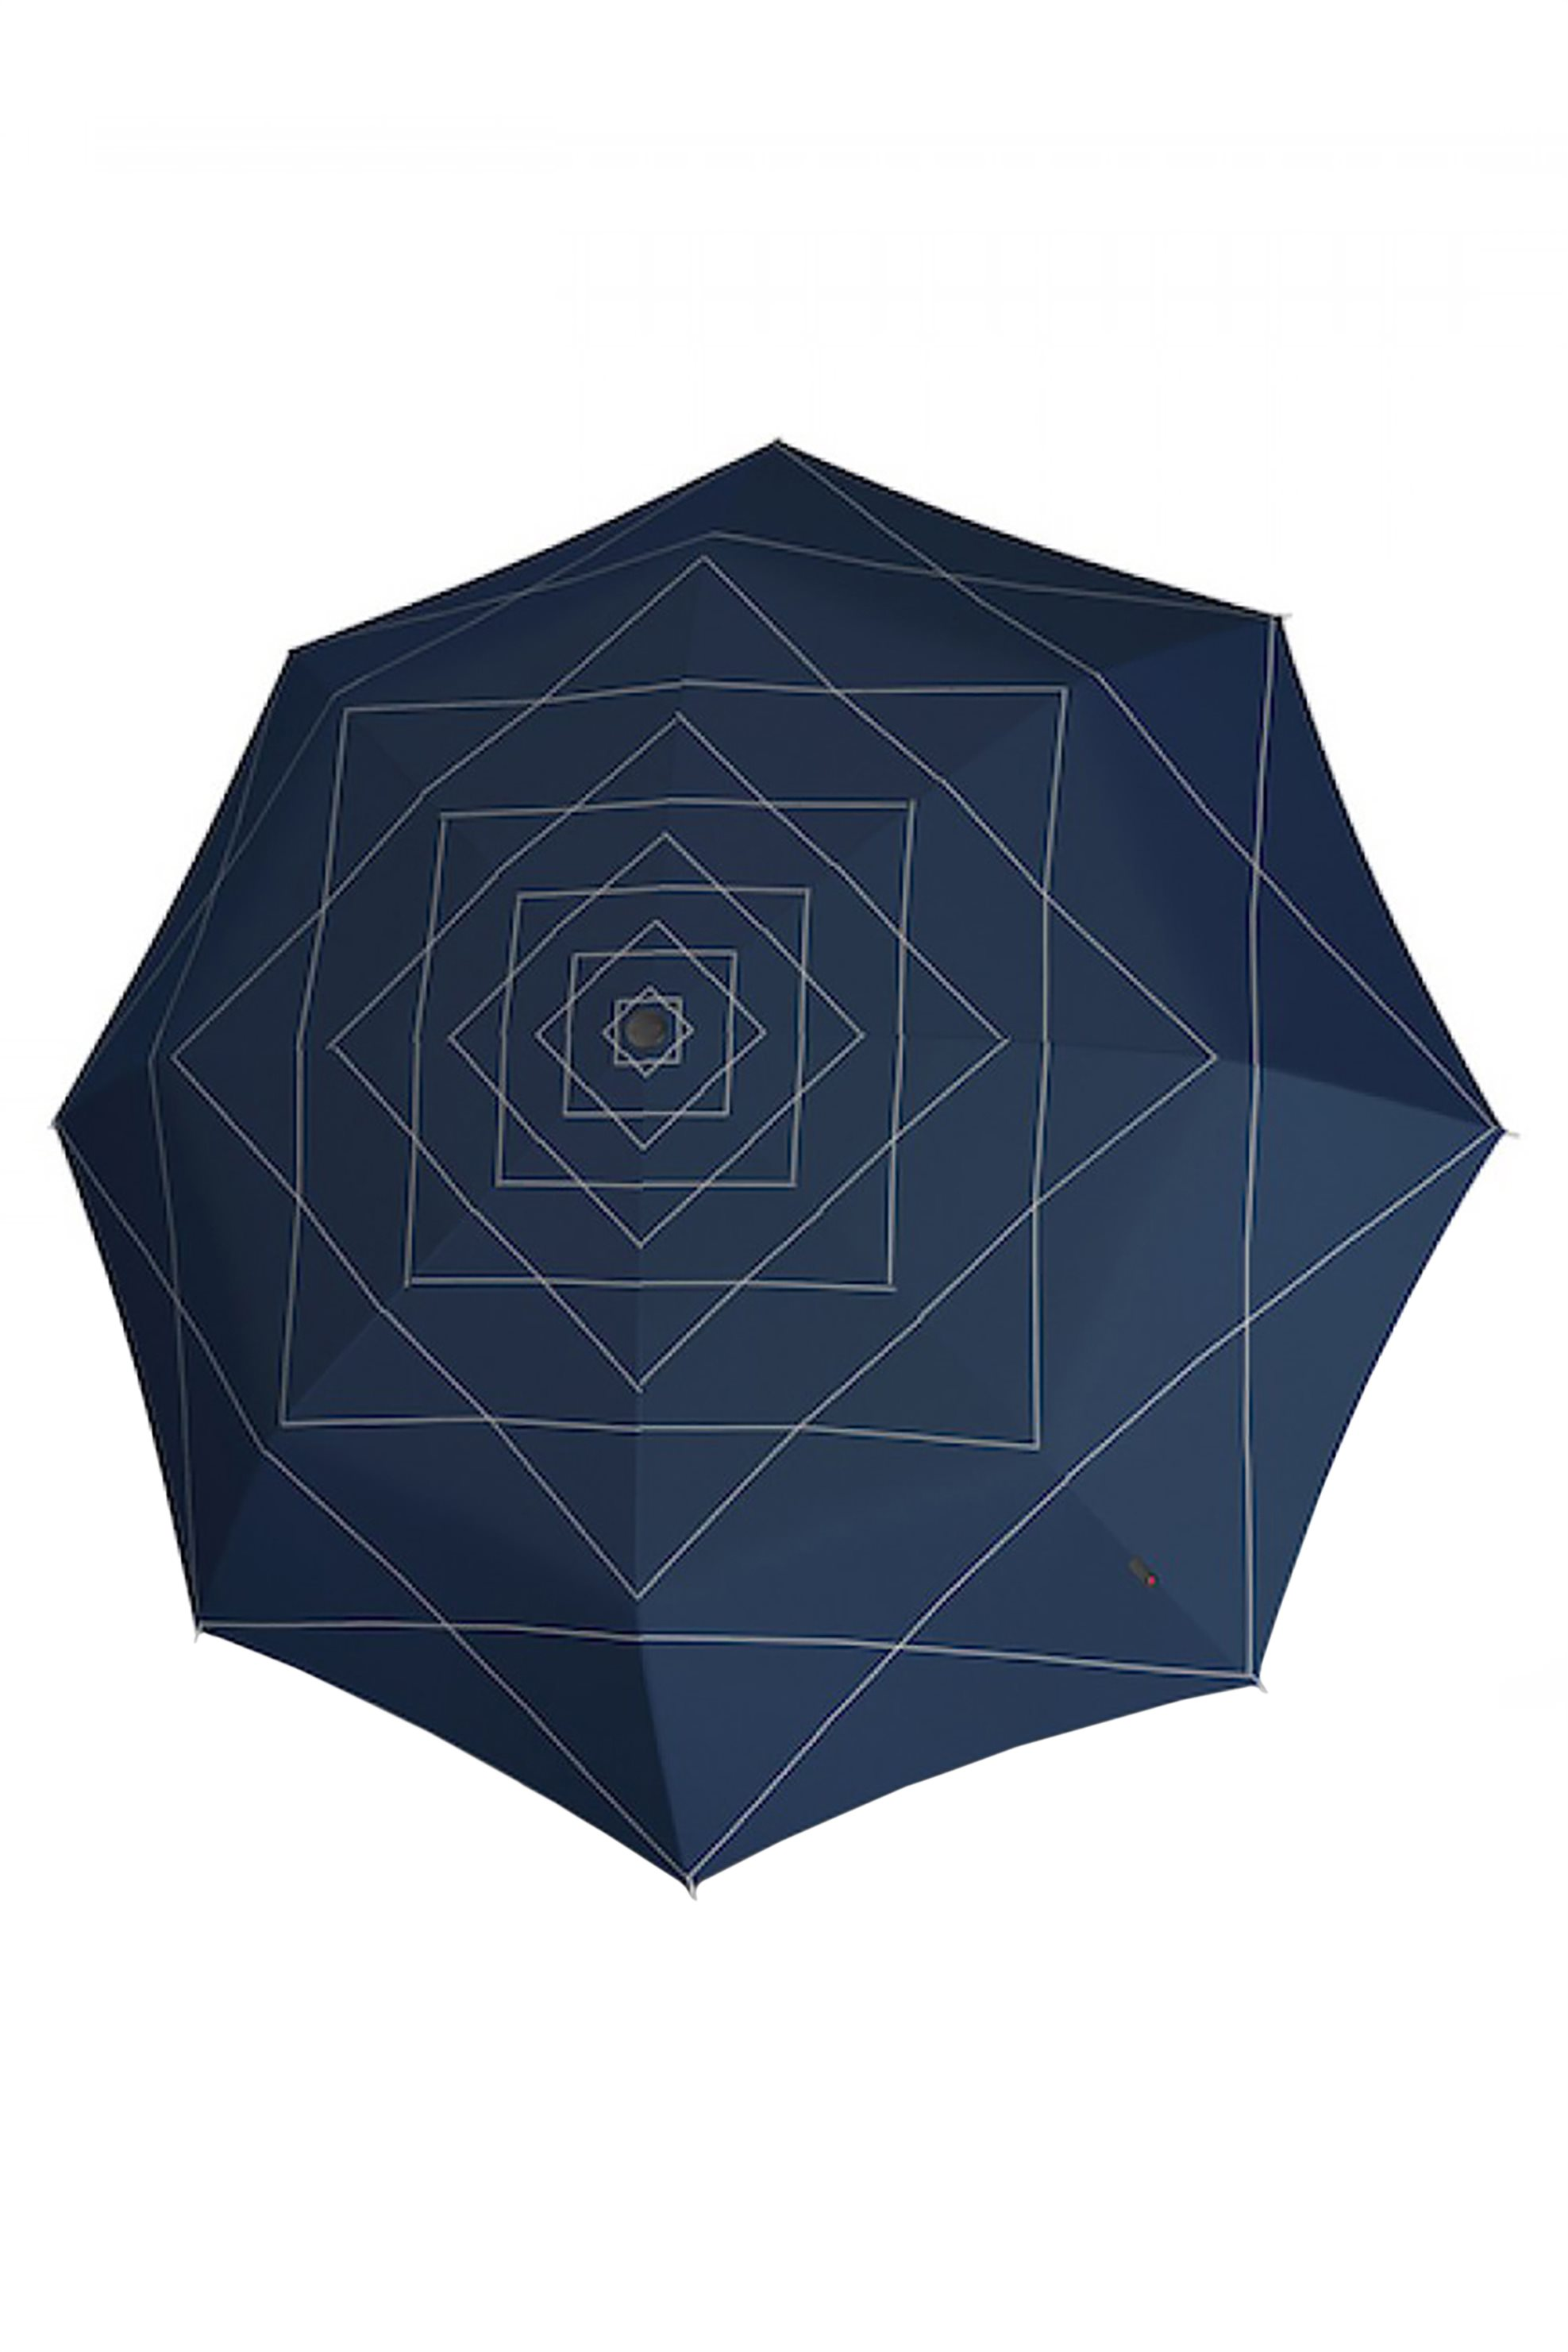 Knirps πτυσσόμενη ομπρέλα με print ''Duomatic'' - KNUM72008315 - Μπλε Σκούρο